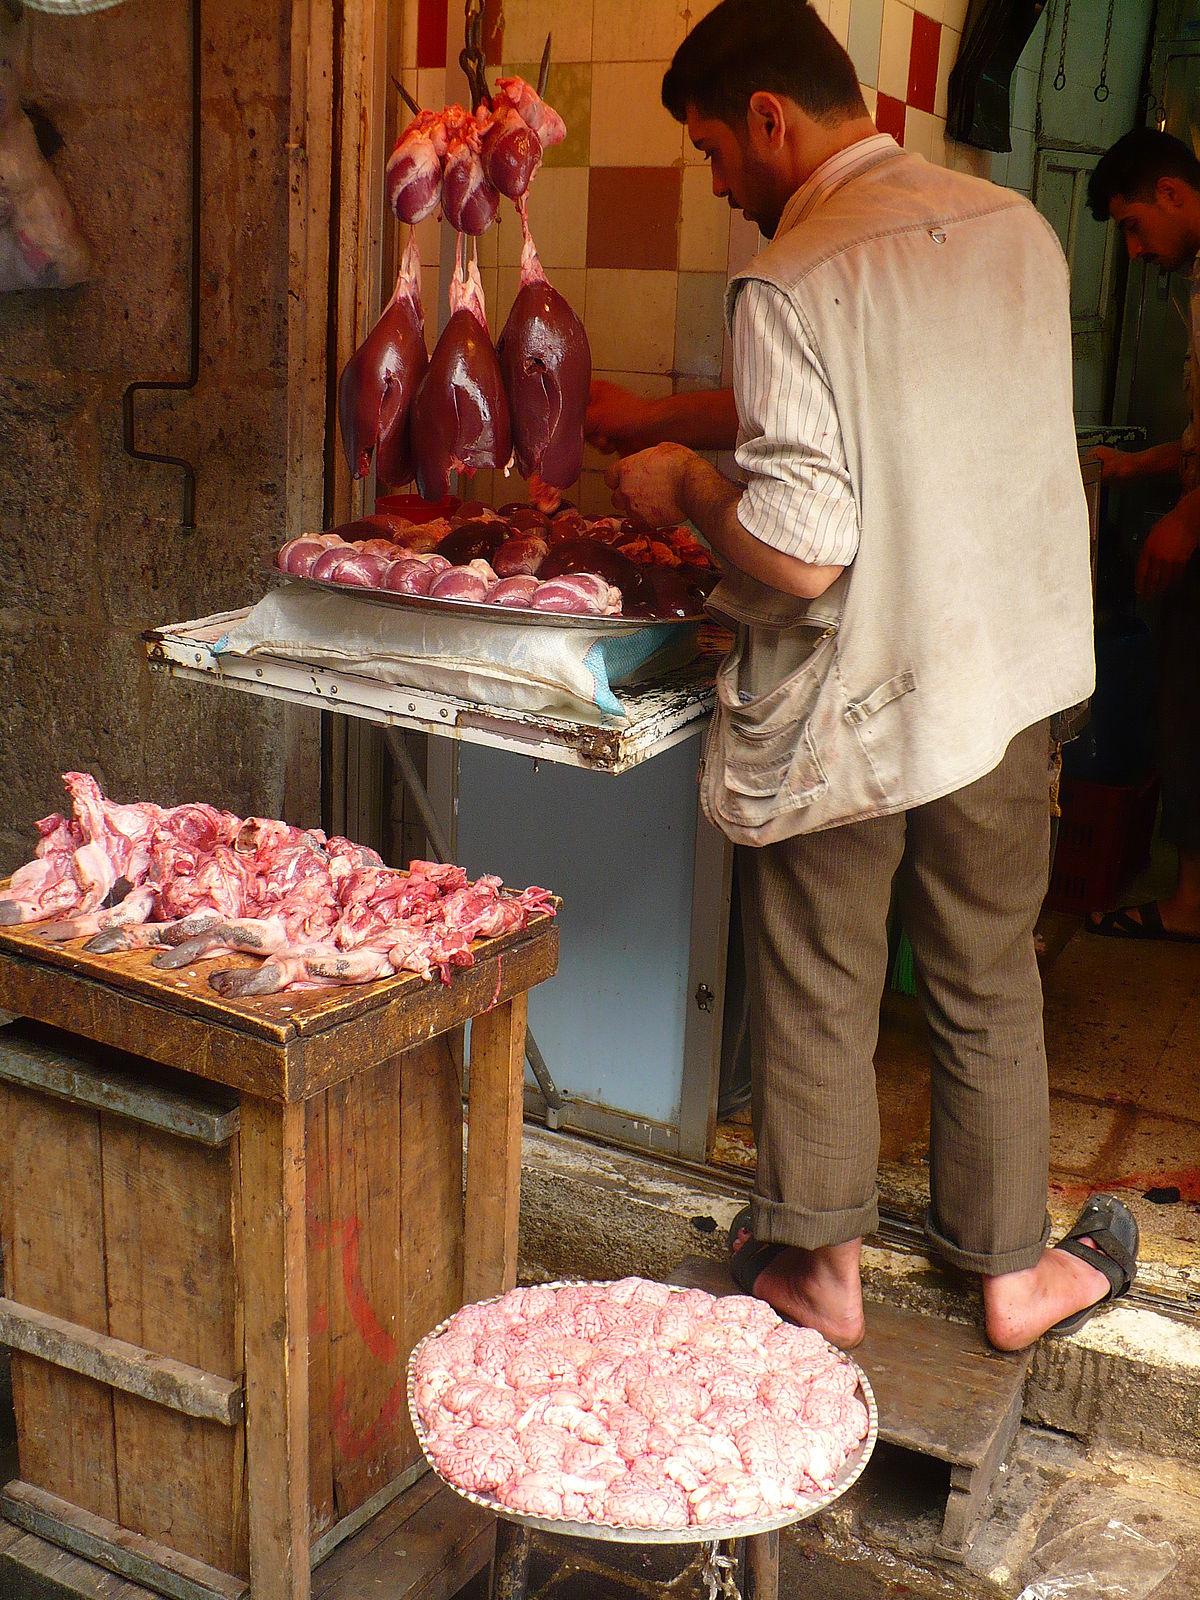 butcher - Wikidata